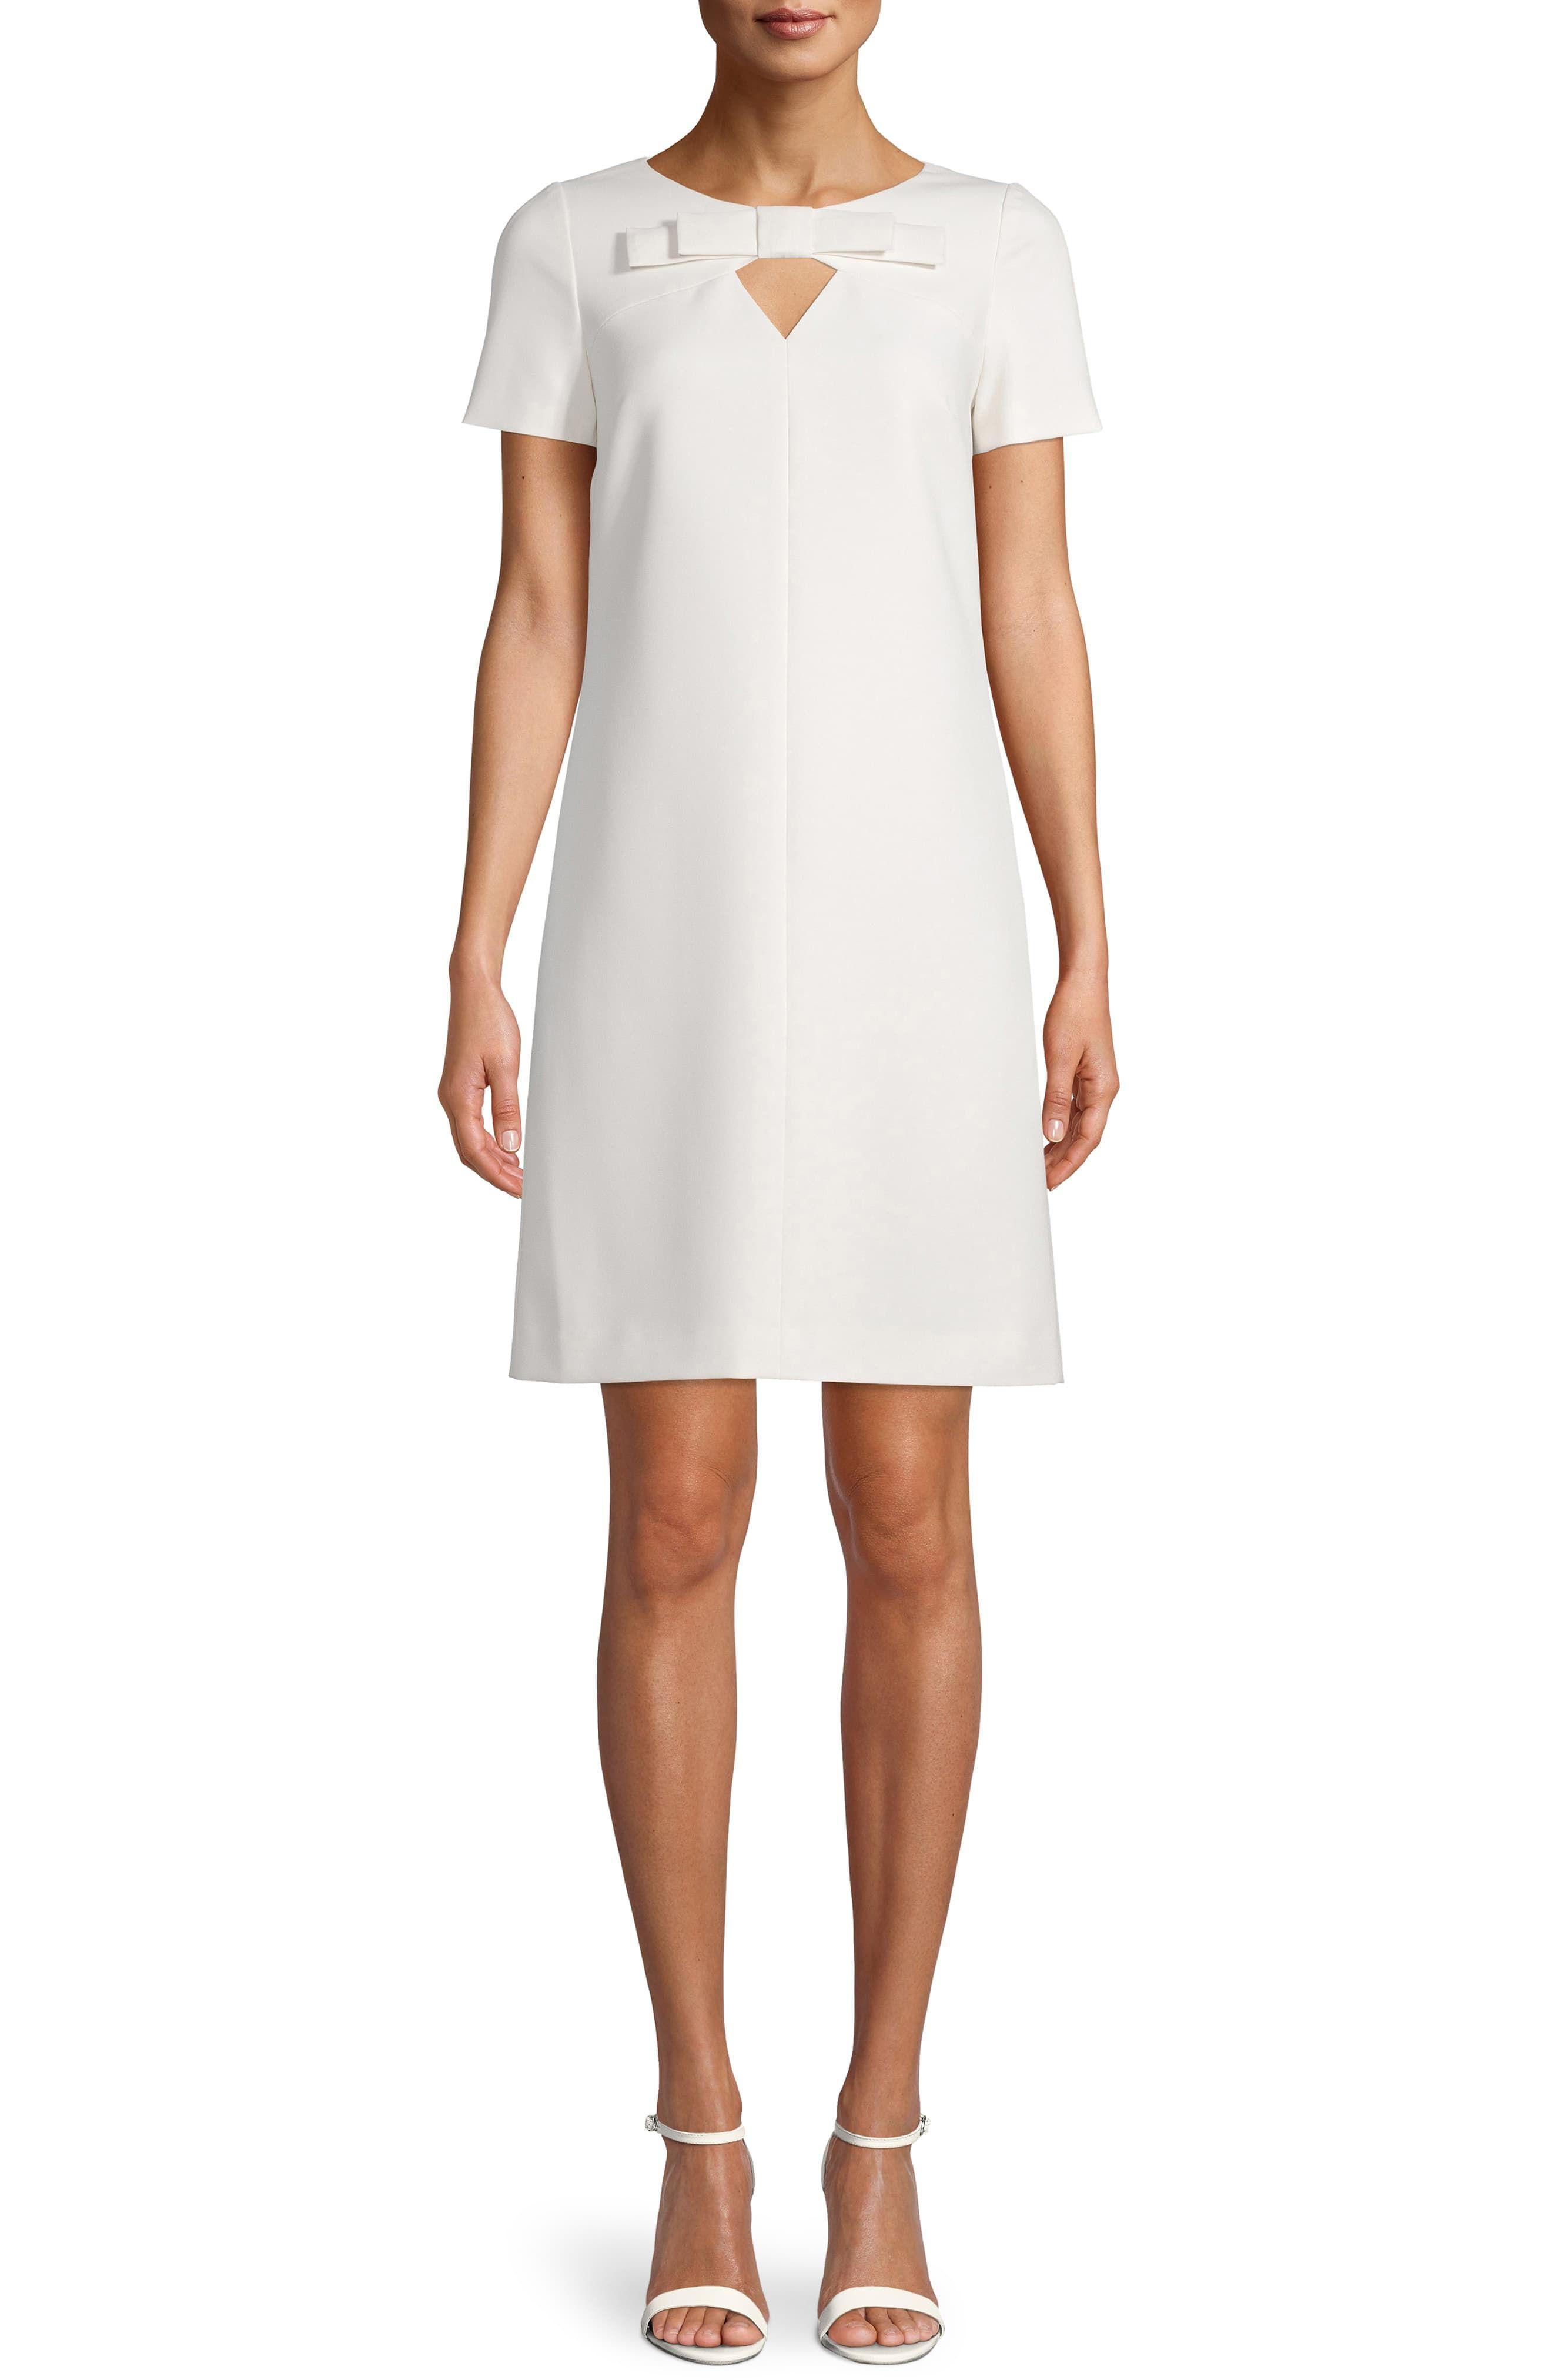 Anne Klein Bow Keyhole Shift Dress Nordstrom In 2021 Short Sleeve Shift Dress Anne Klein Clothing Shift Dress [ 4048 x 2640 Pixel ]